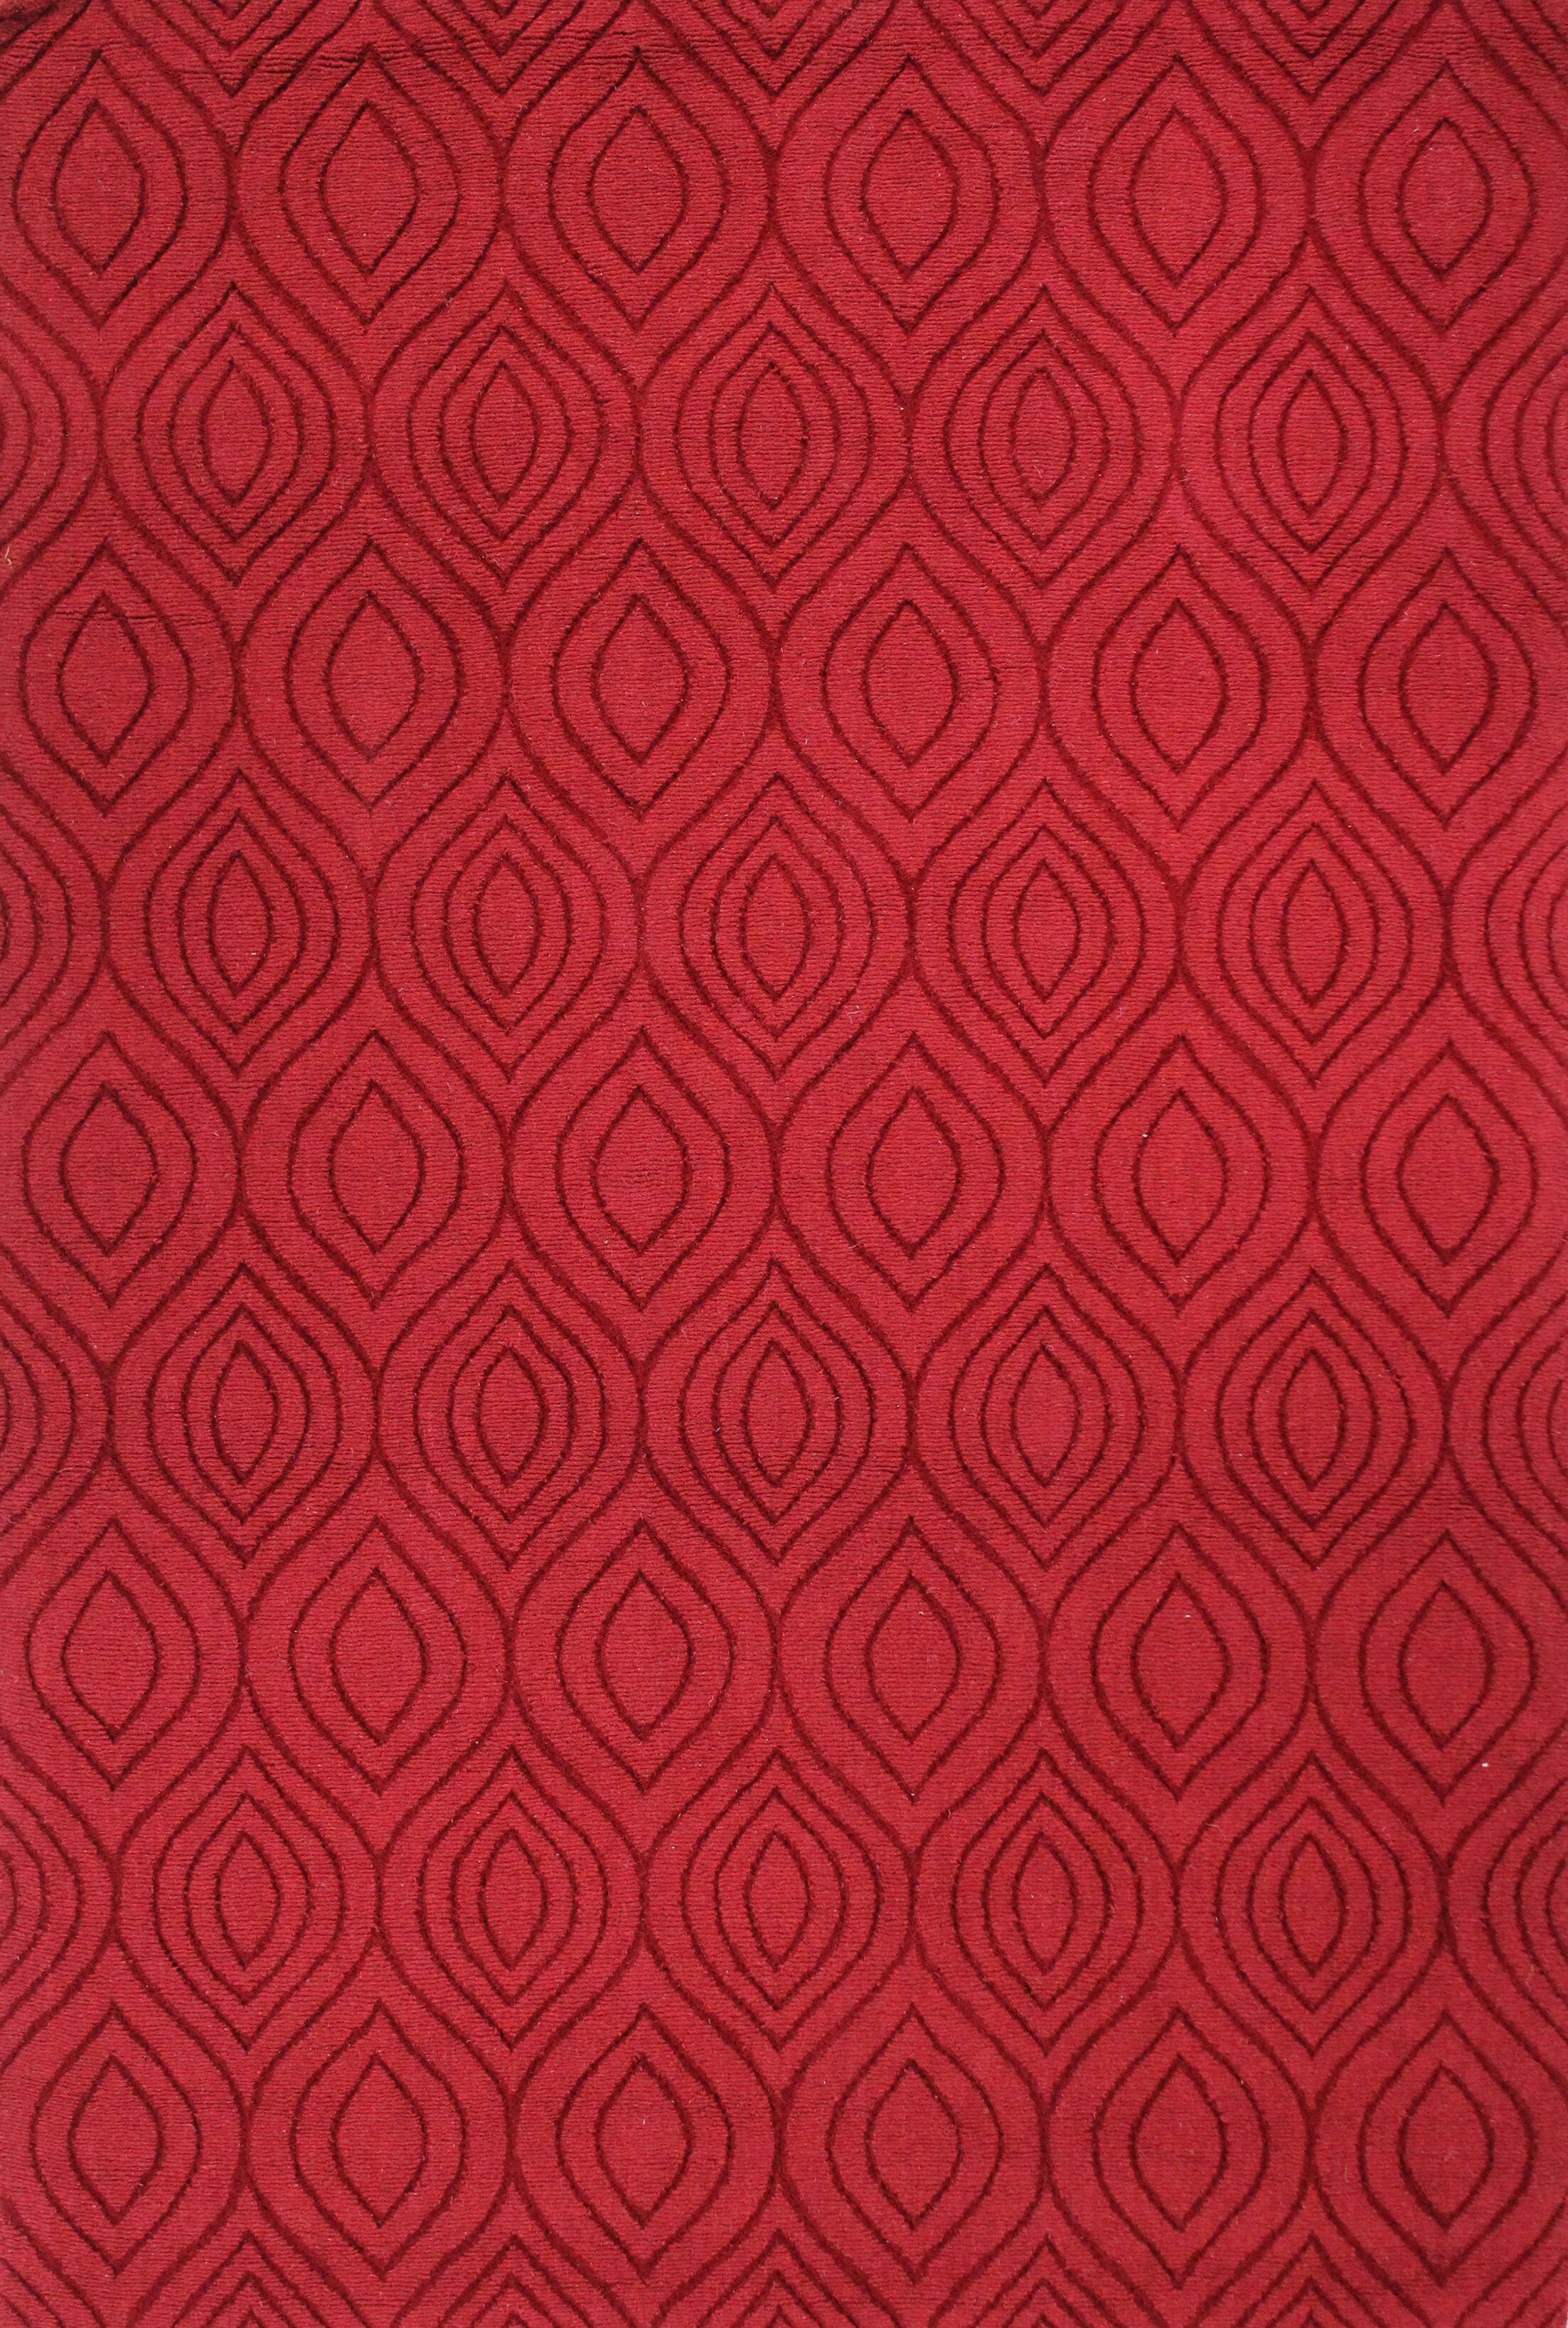 Mizel Handmade Red Area Rug Rug Size: Rectangle 7'6